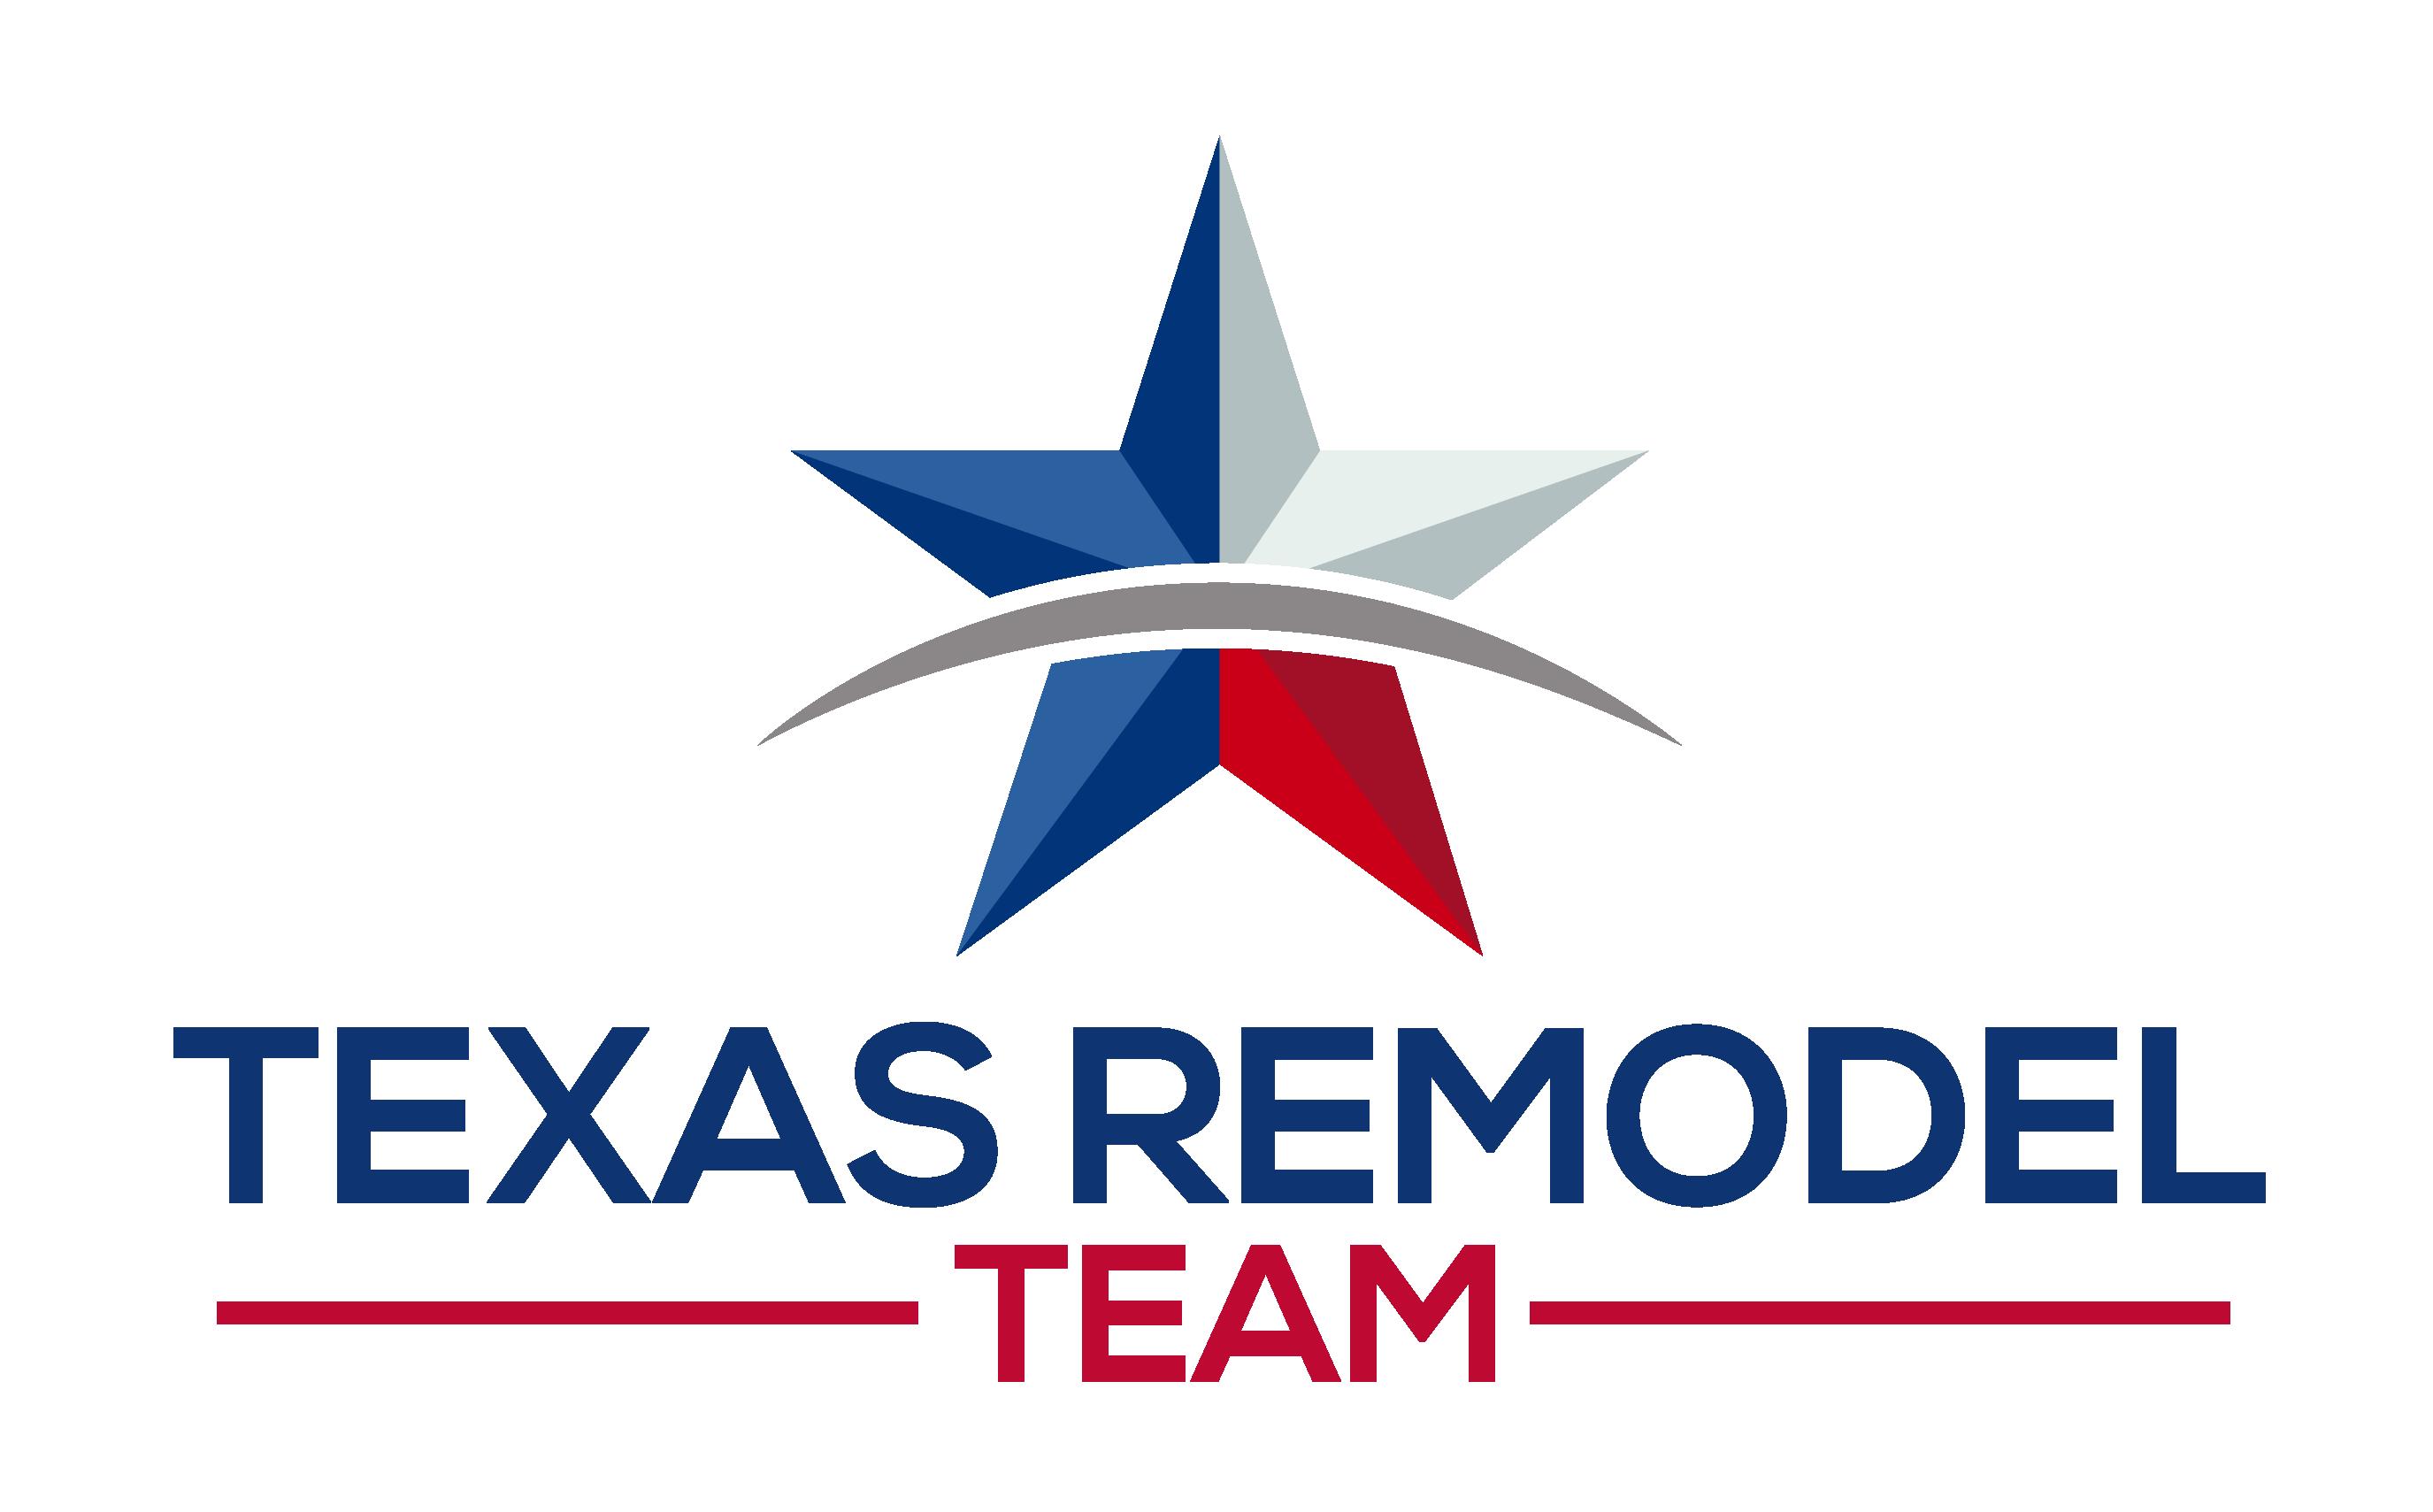 Texas Remodel Team